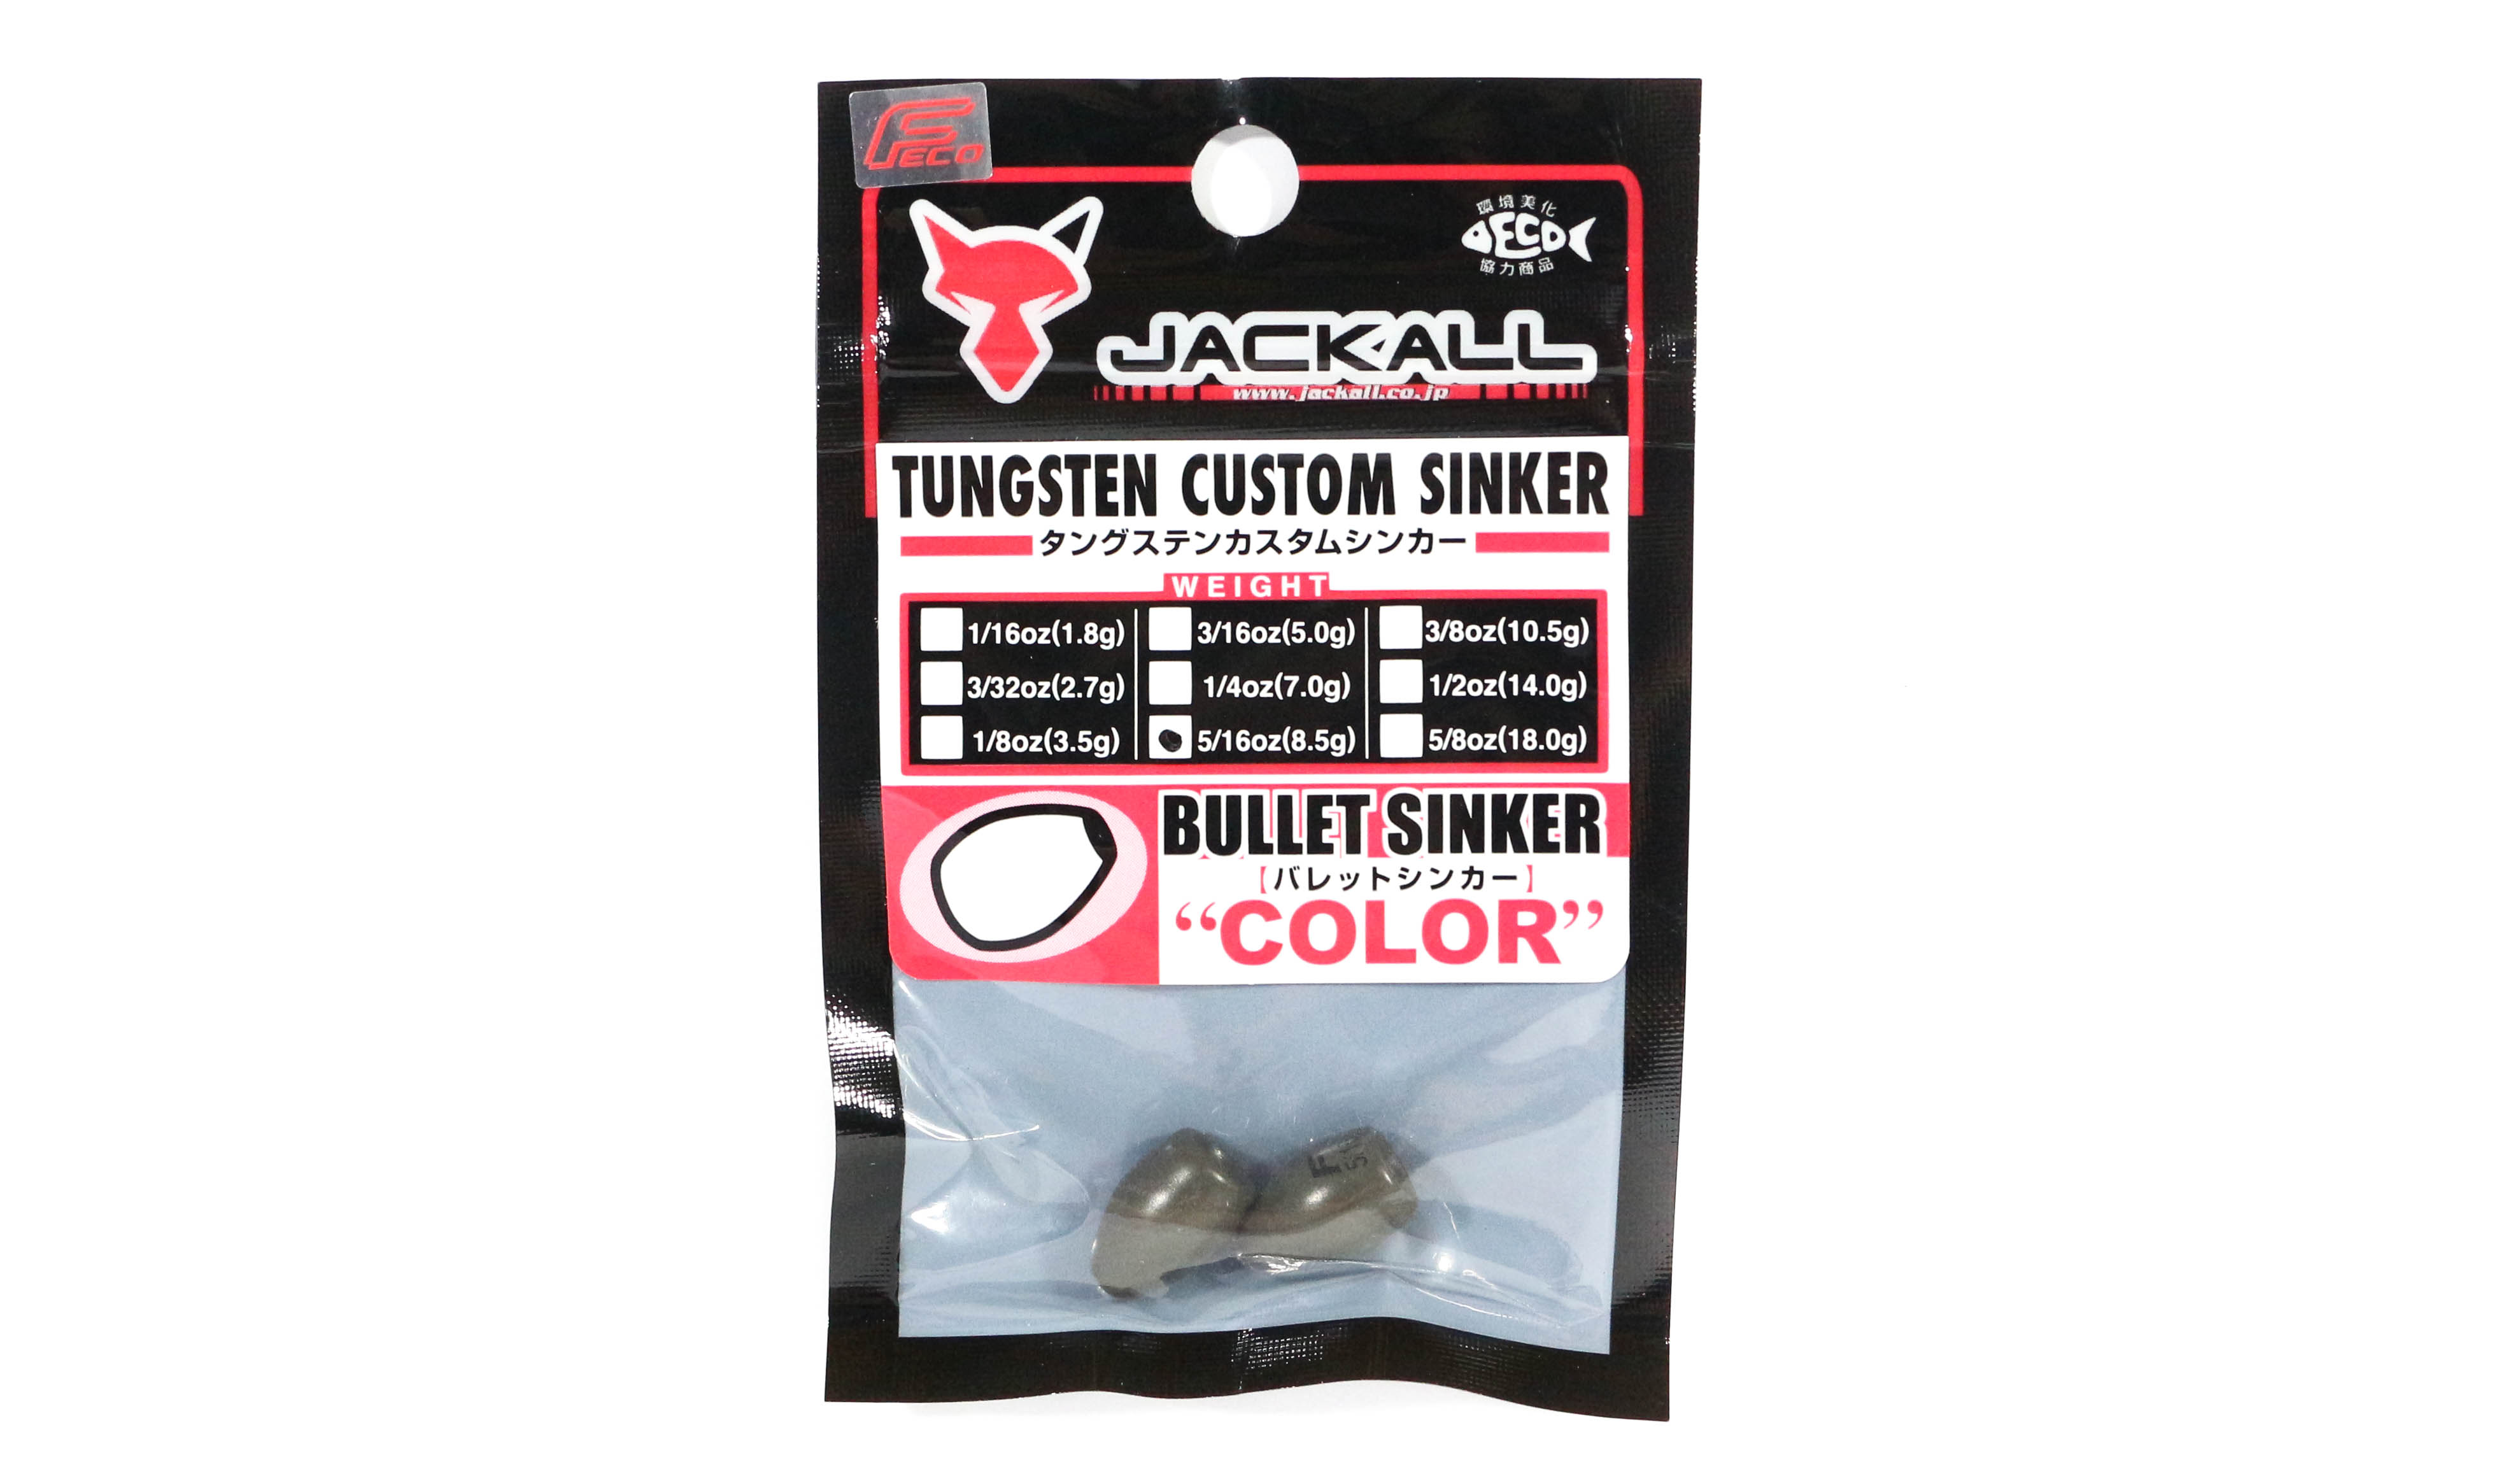 Jackall Tungsten Bullet Sinker Color 8.5 Grams - 2 Pcs Per Pack (5480)